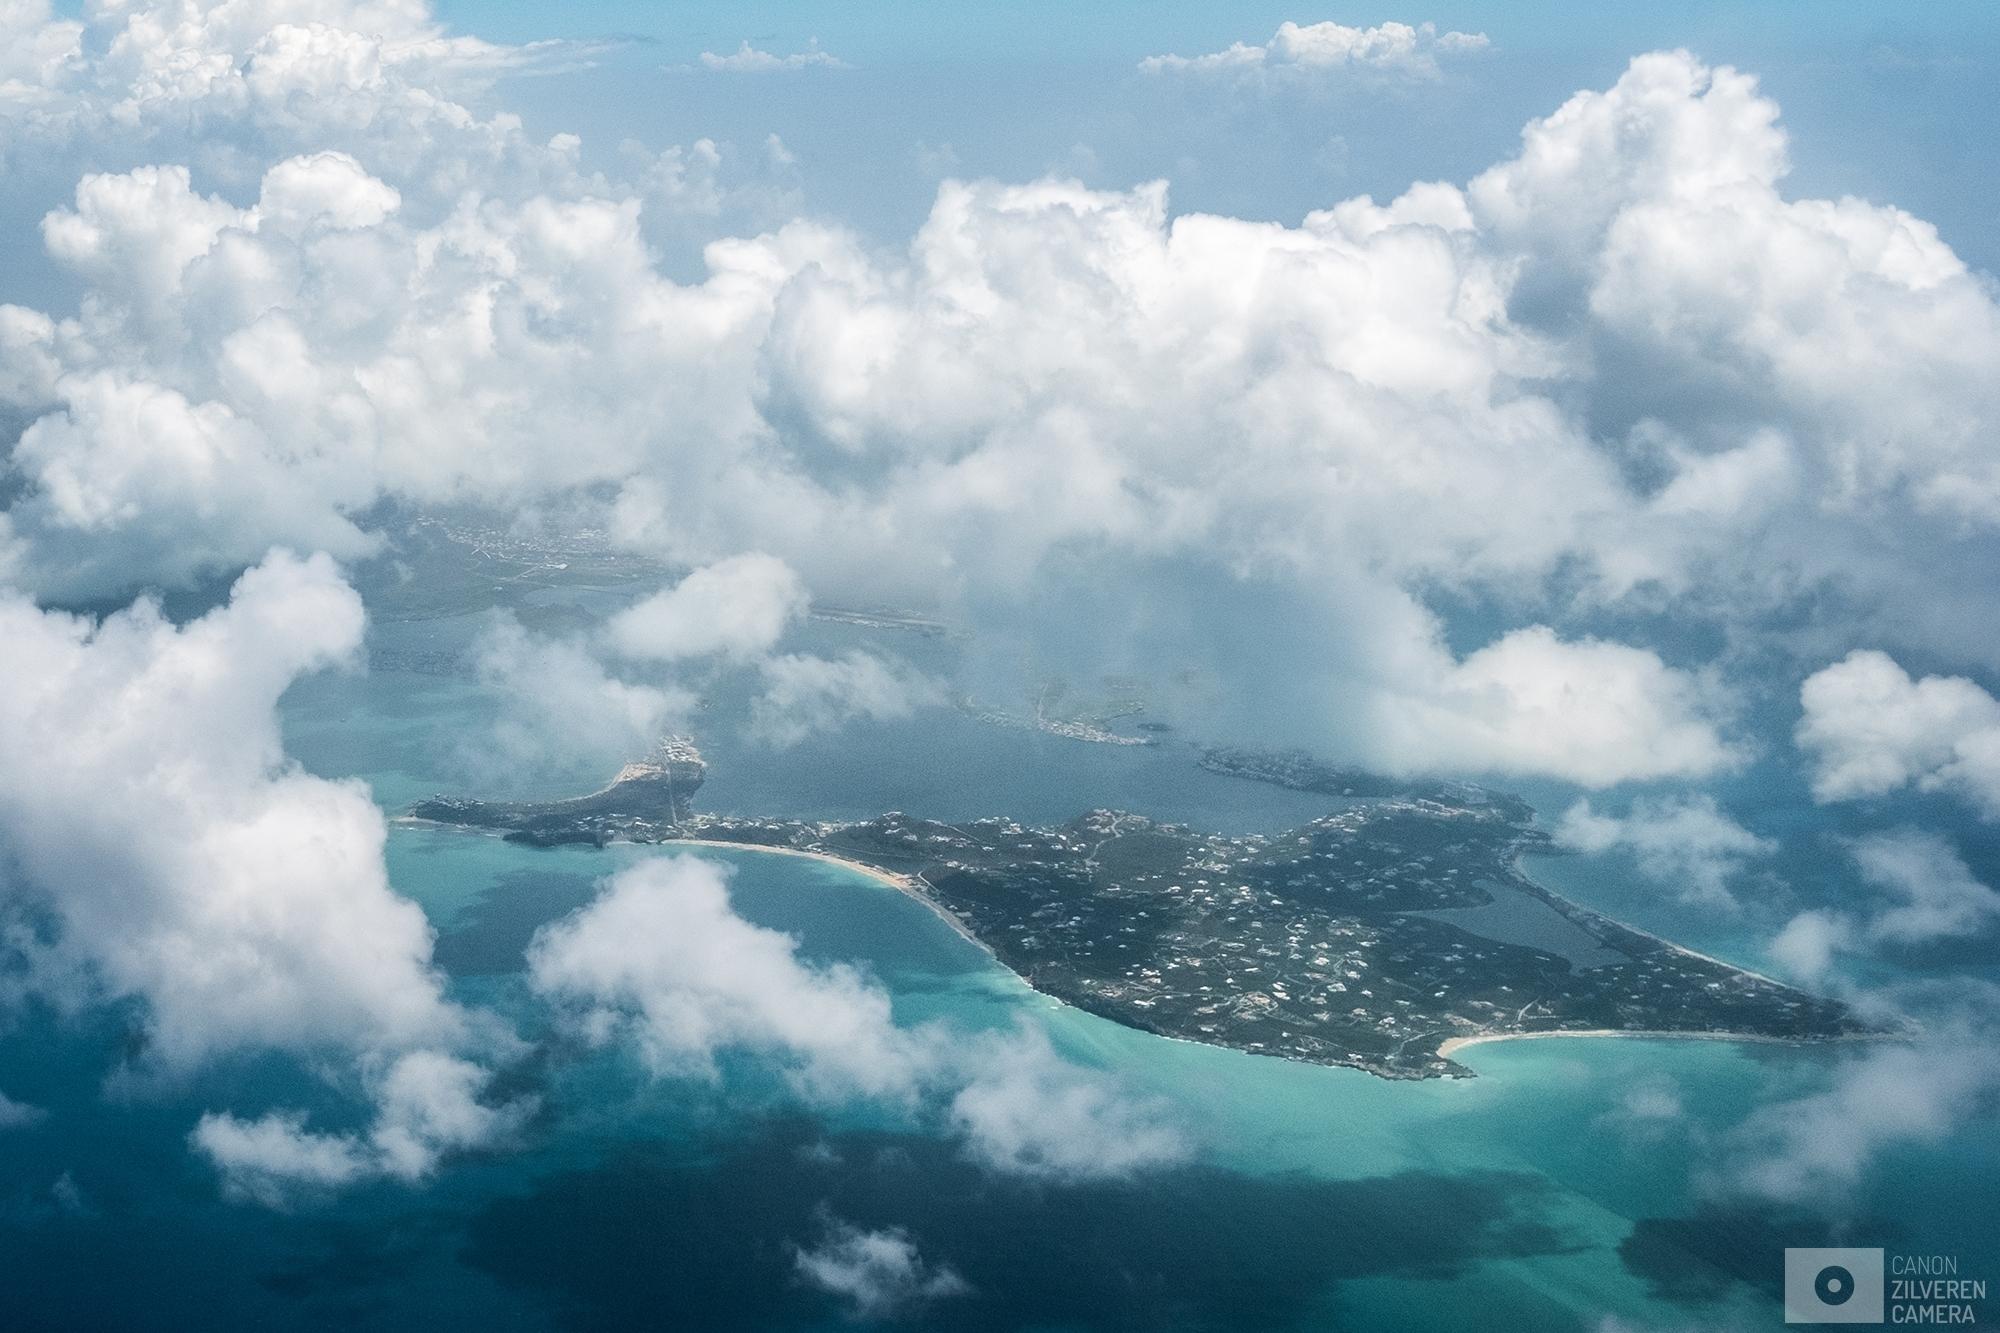 SINT MAARTEN | Aereal view of Sint Maarten, just weeks after Category 5 hurricane Irma hit the small island. | #2